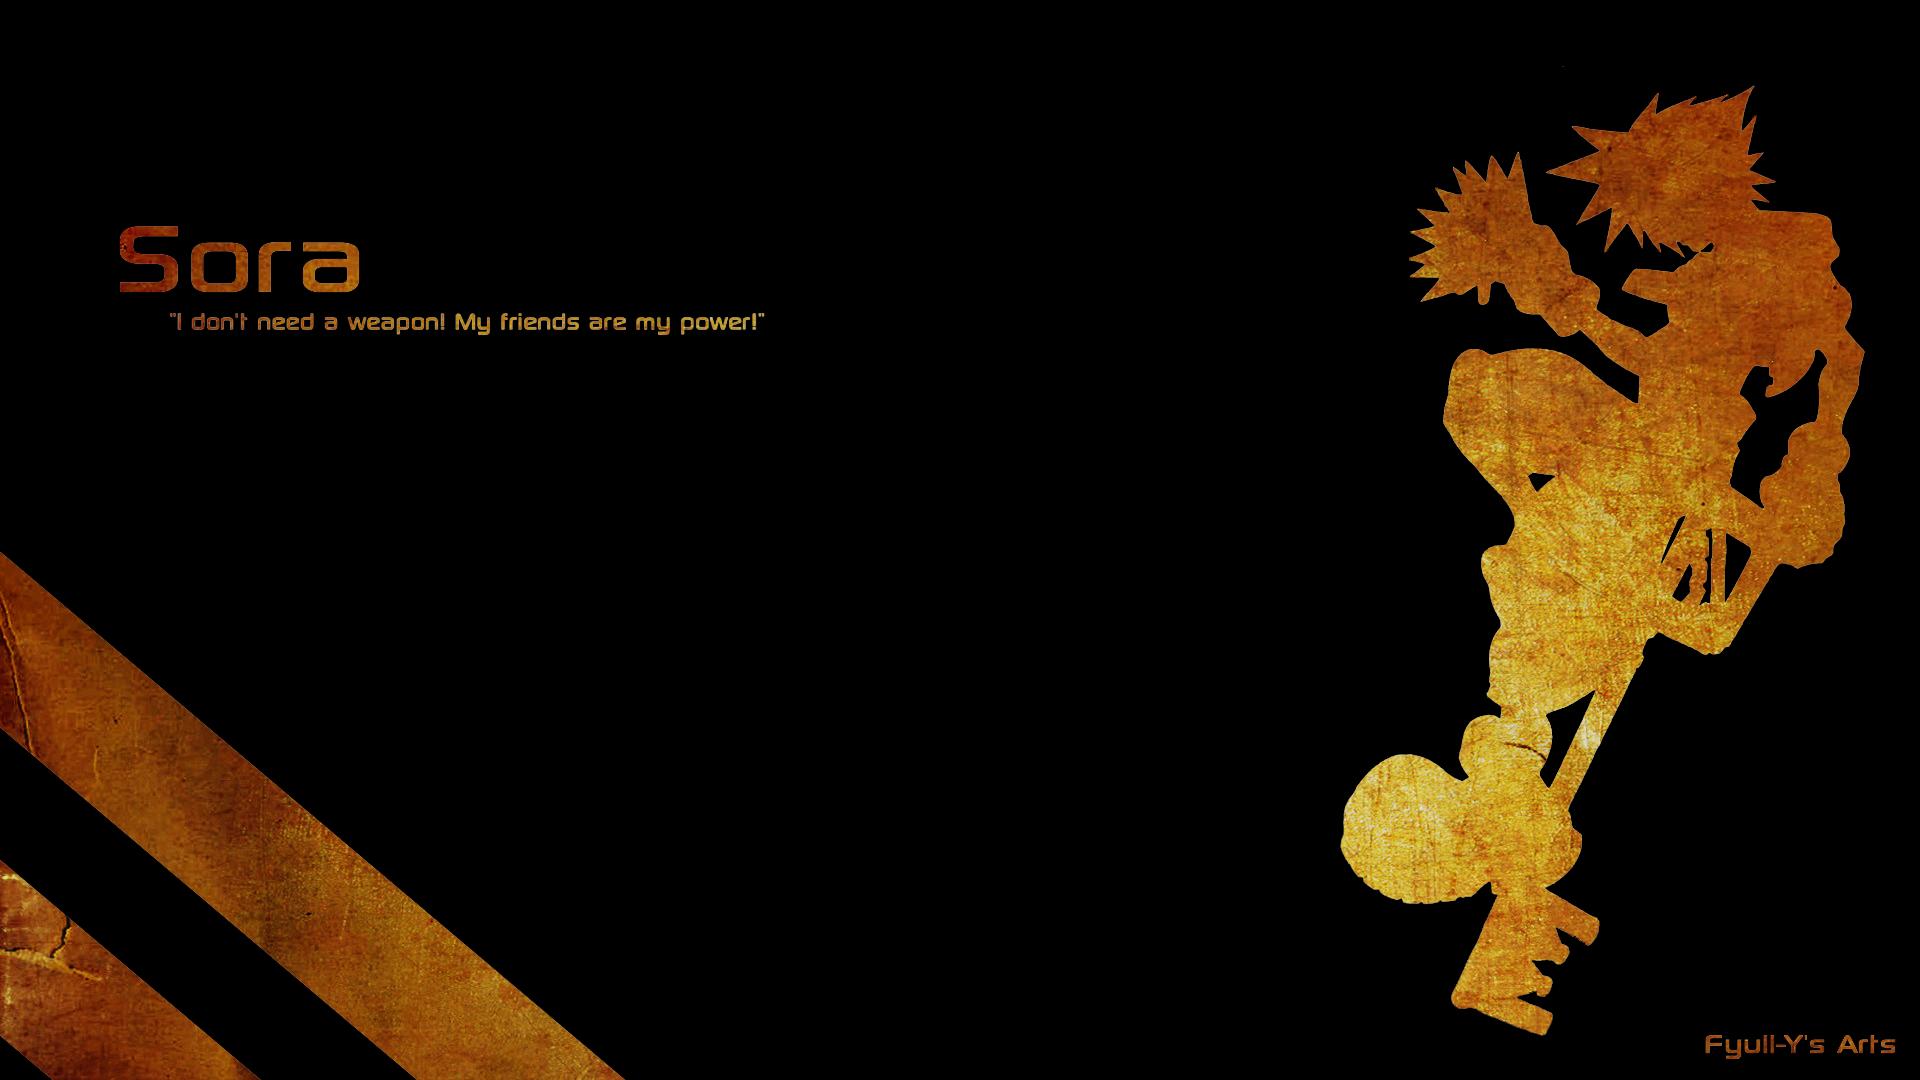 Kingdom Hearts Sora Wallpaper 1920x1080 Kingdom Hearts Sora Wa...